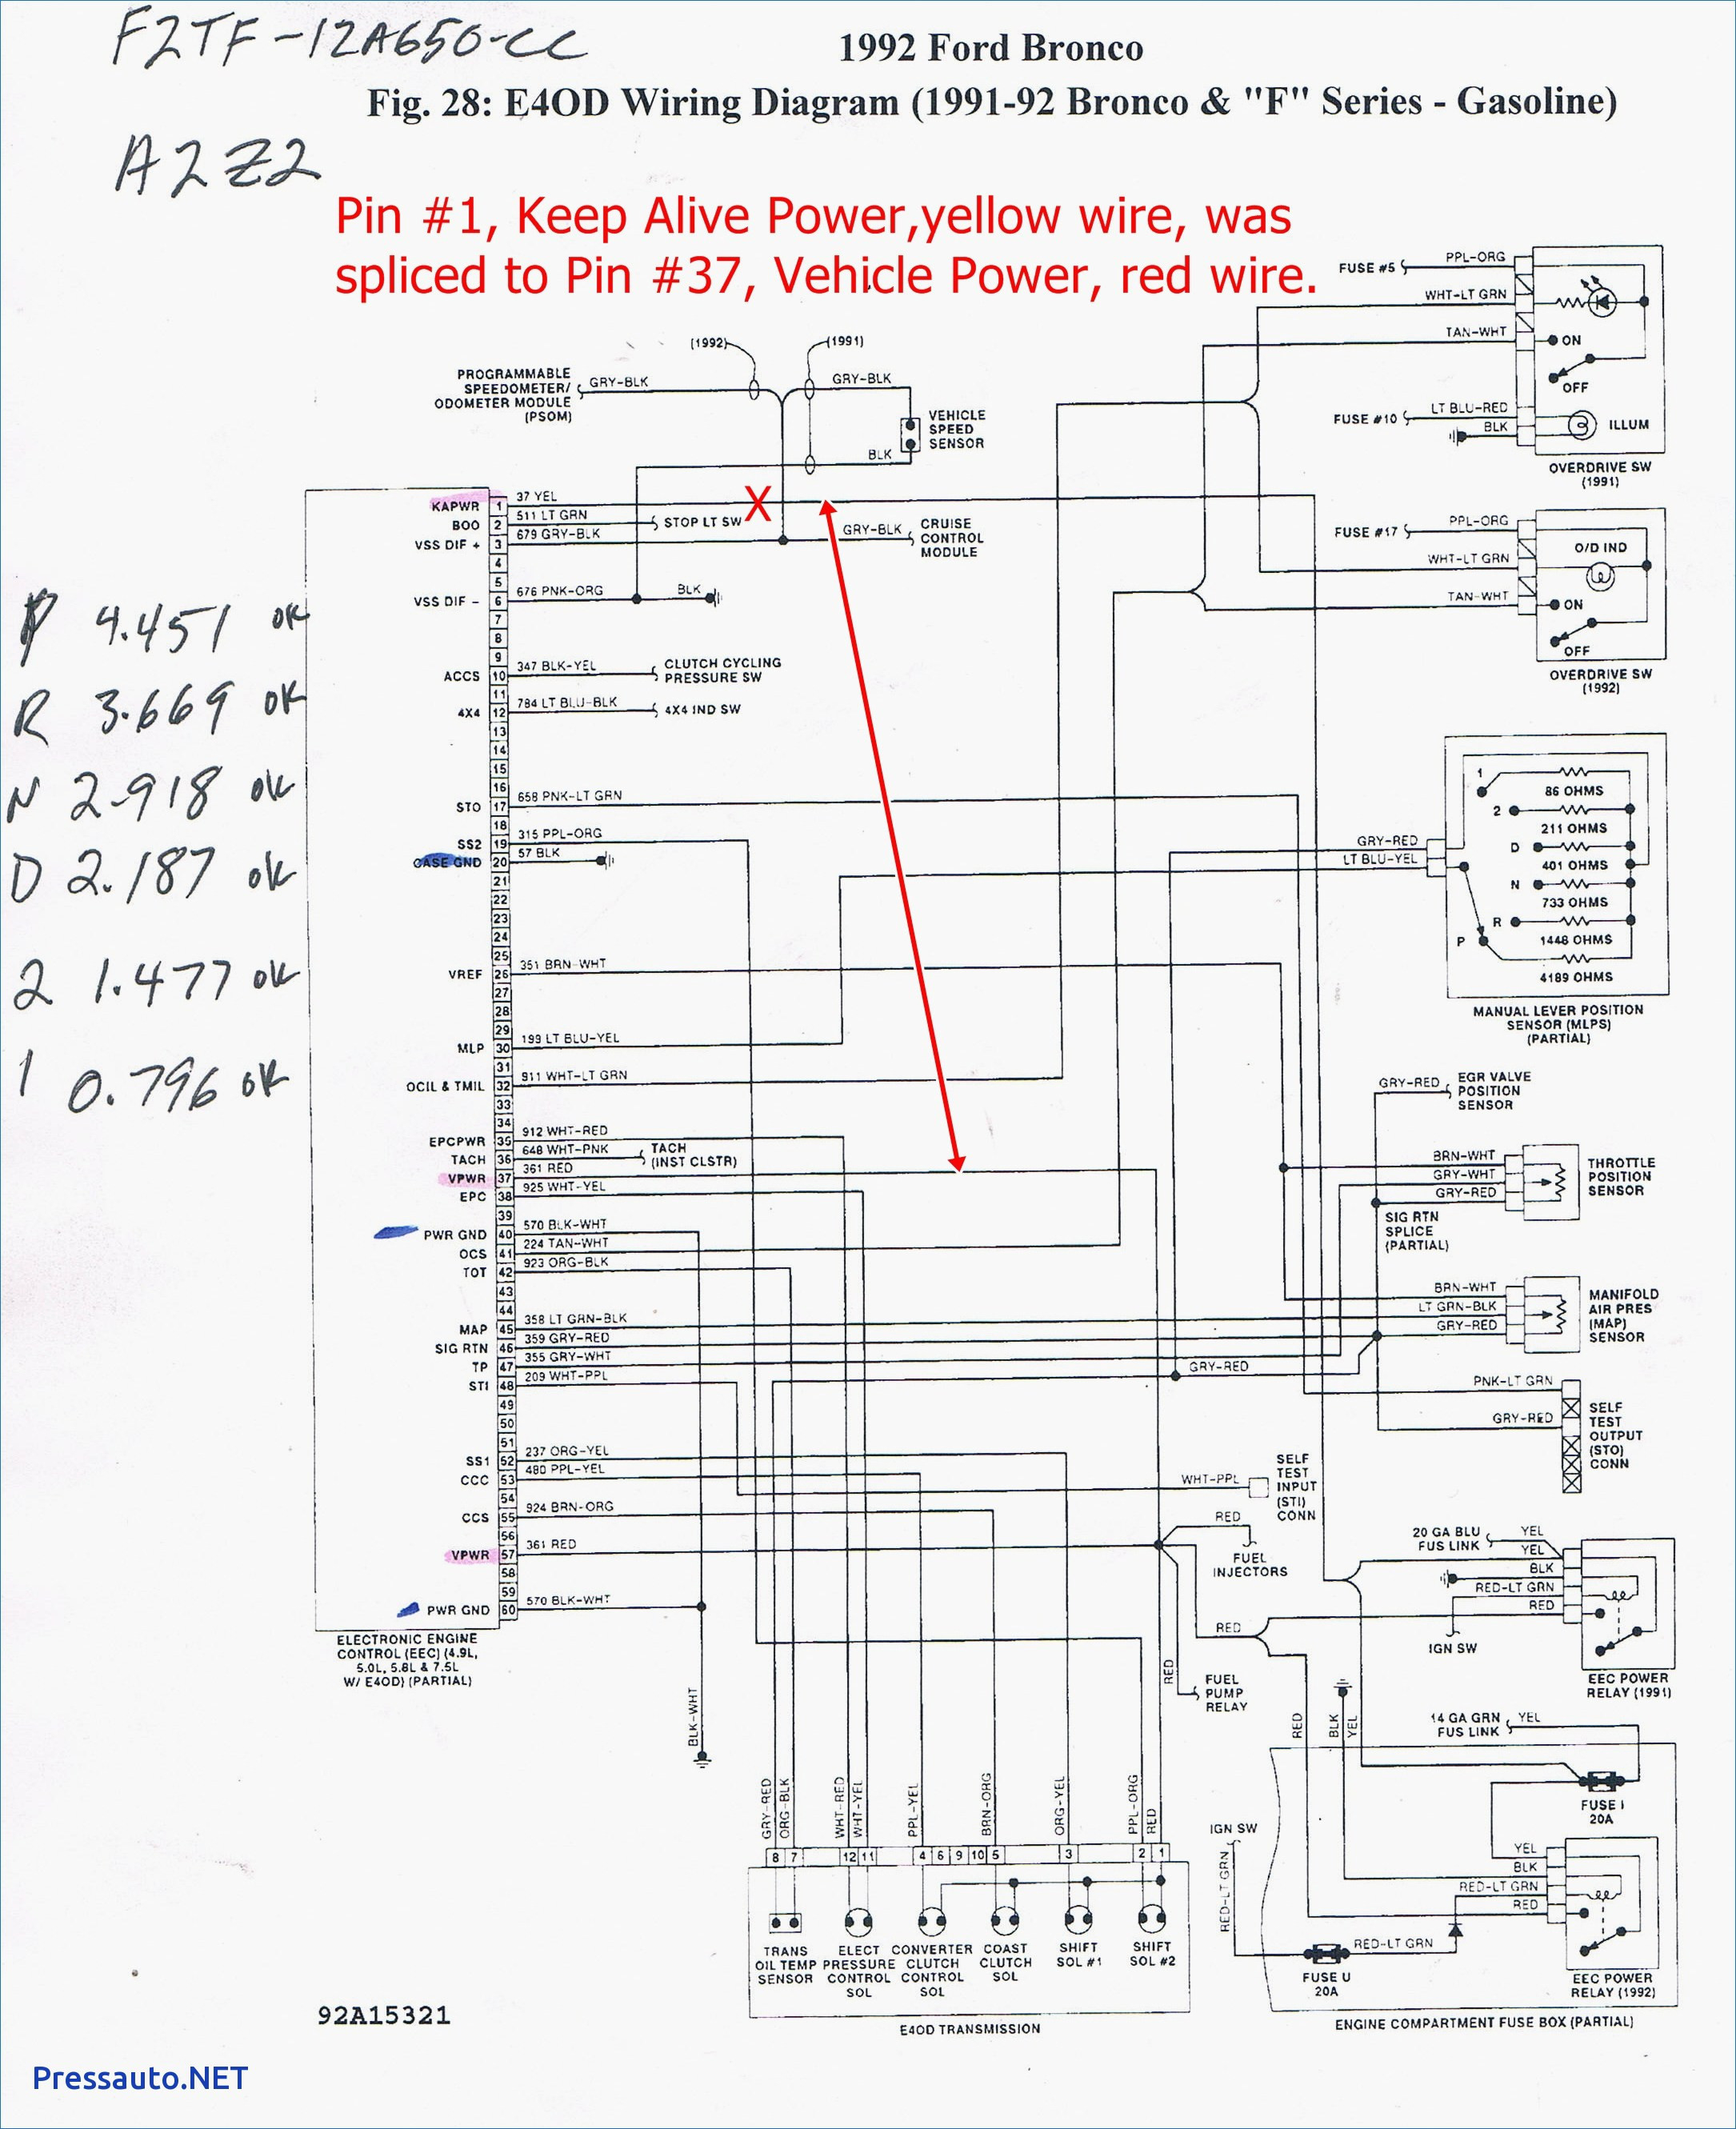 FX_8069] Hannay Reels Wiring Diagram Download Diagram | Ford F550 Pto Wiring Diagram |  | Scata Basi Xaem Mohammedshrine Librar Wiring 101